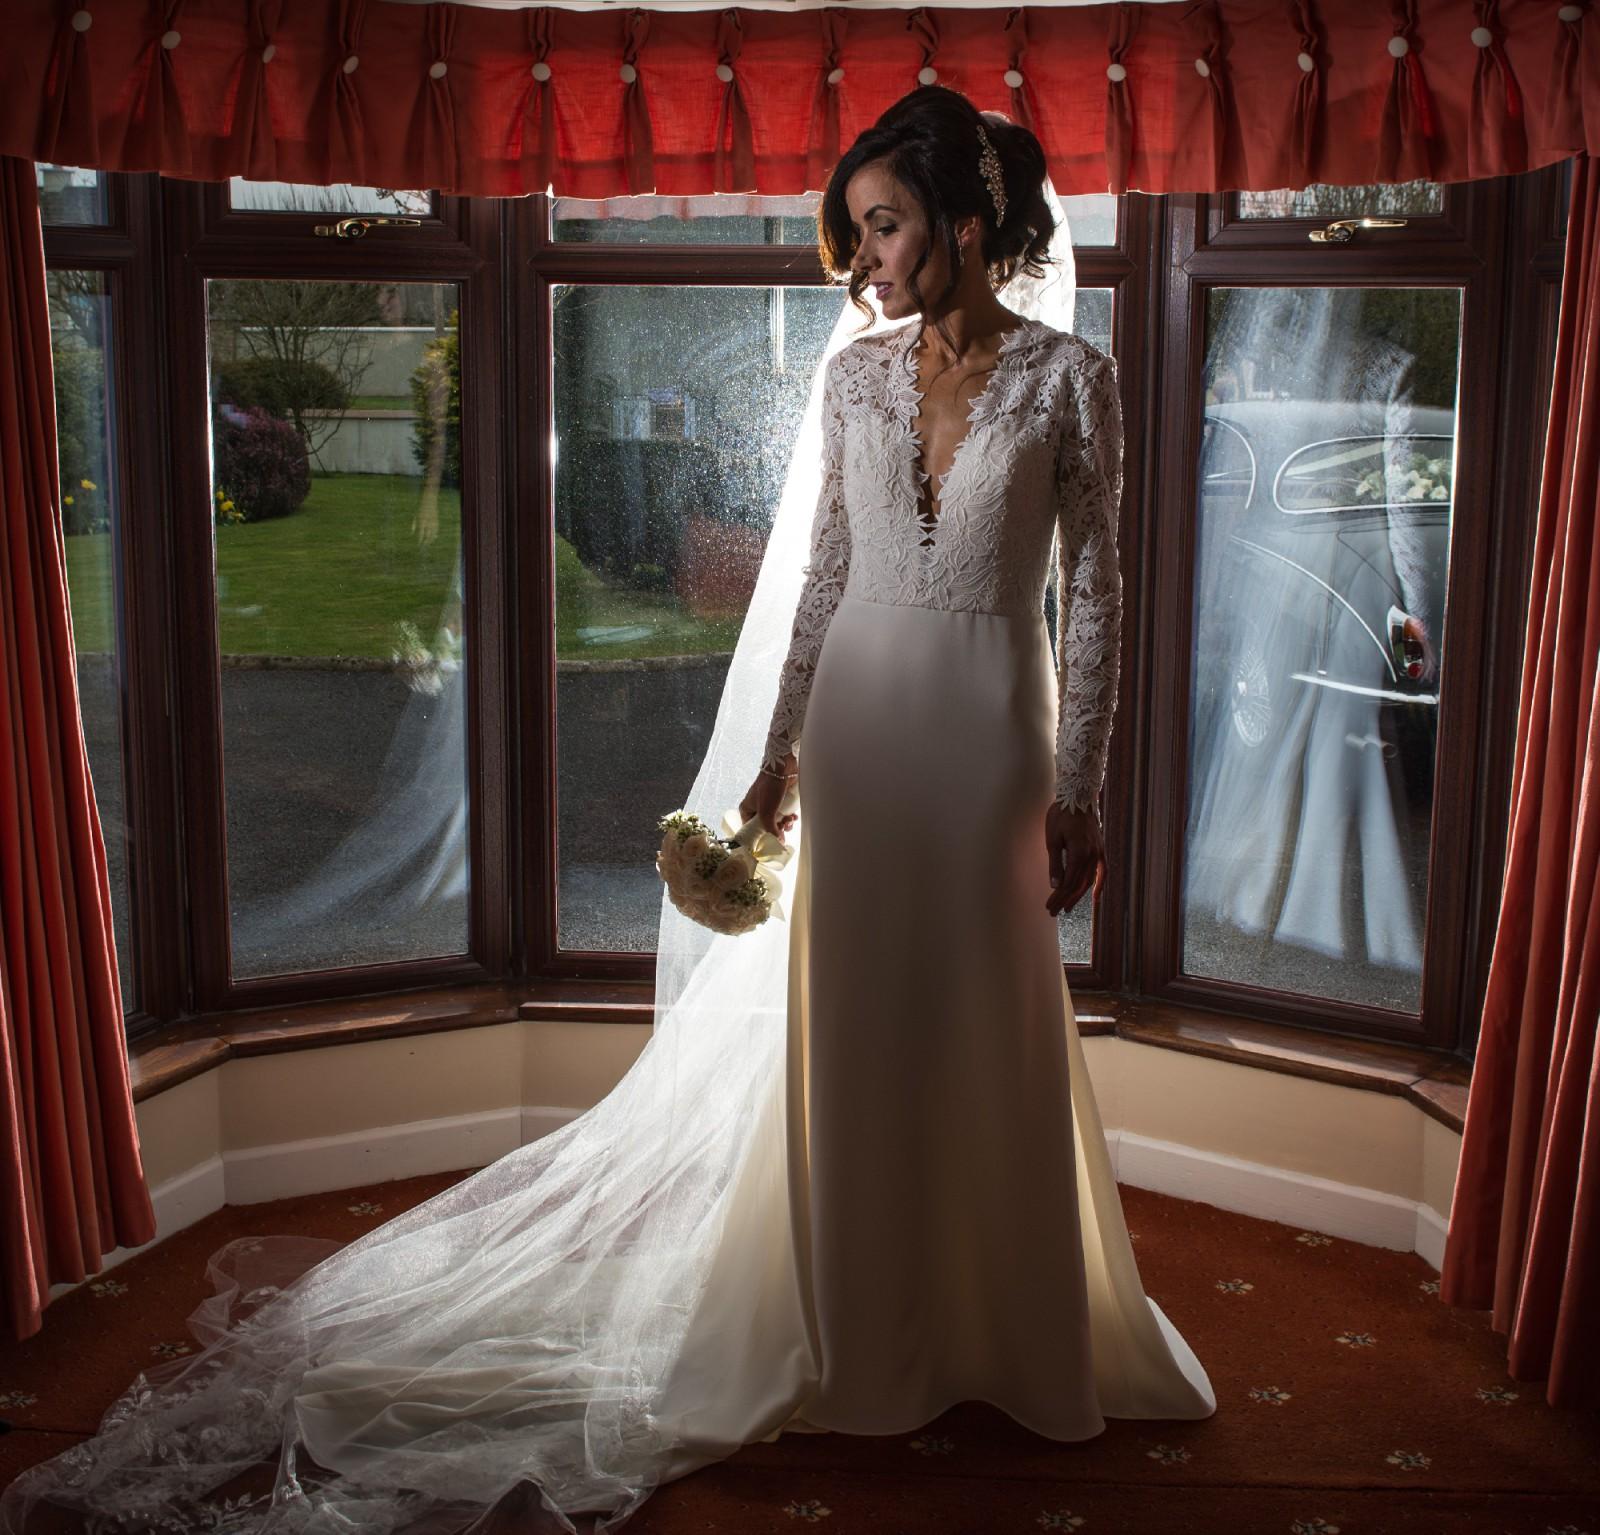 Tara Keely Wedding Gowns: Tara Keely TK2450 Preowned Wedding Dress On Sale 54% Off